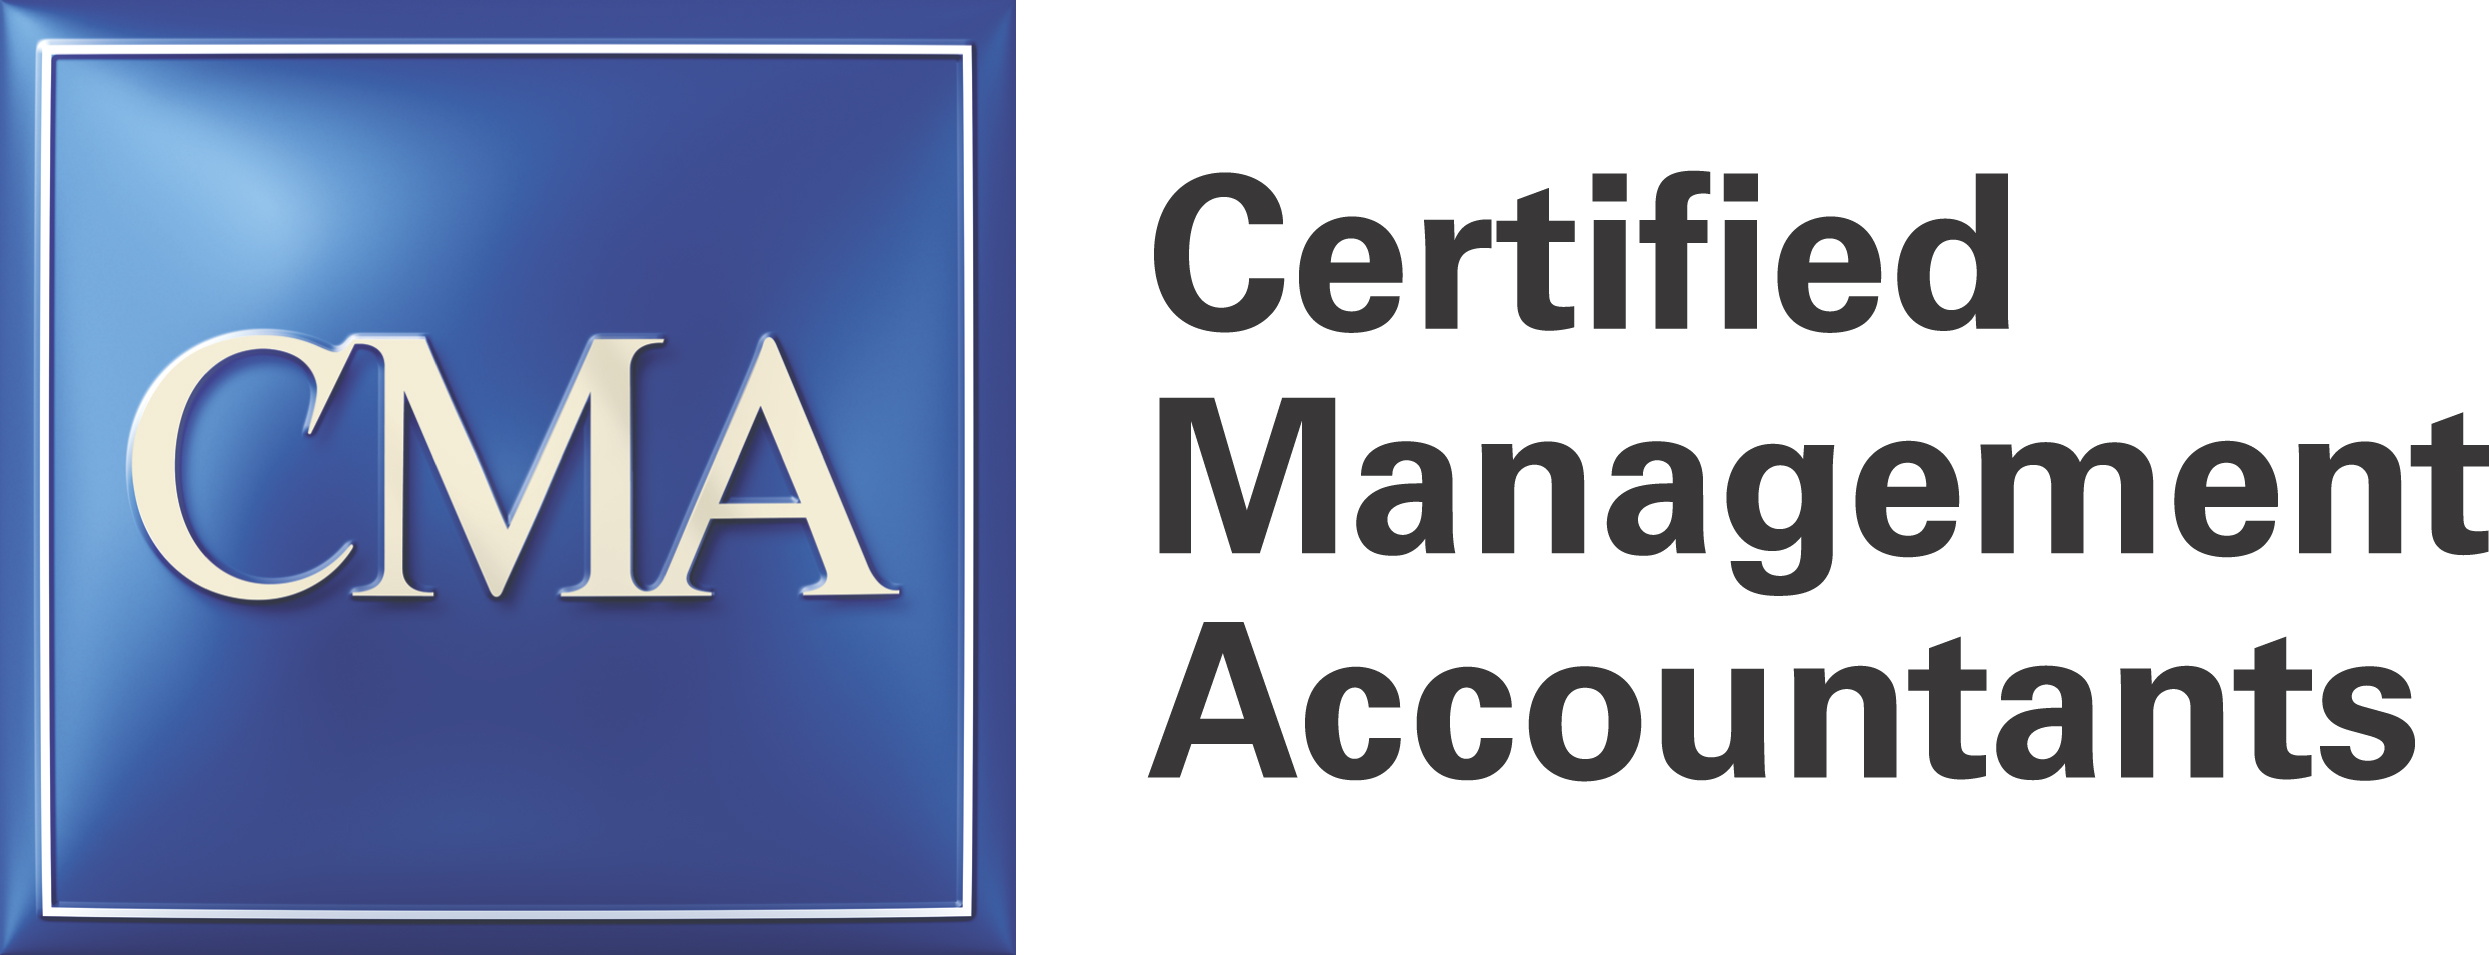 نتيجة بحث الصور عن CMA ISO Consultants in Dubai & UAE